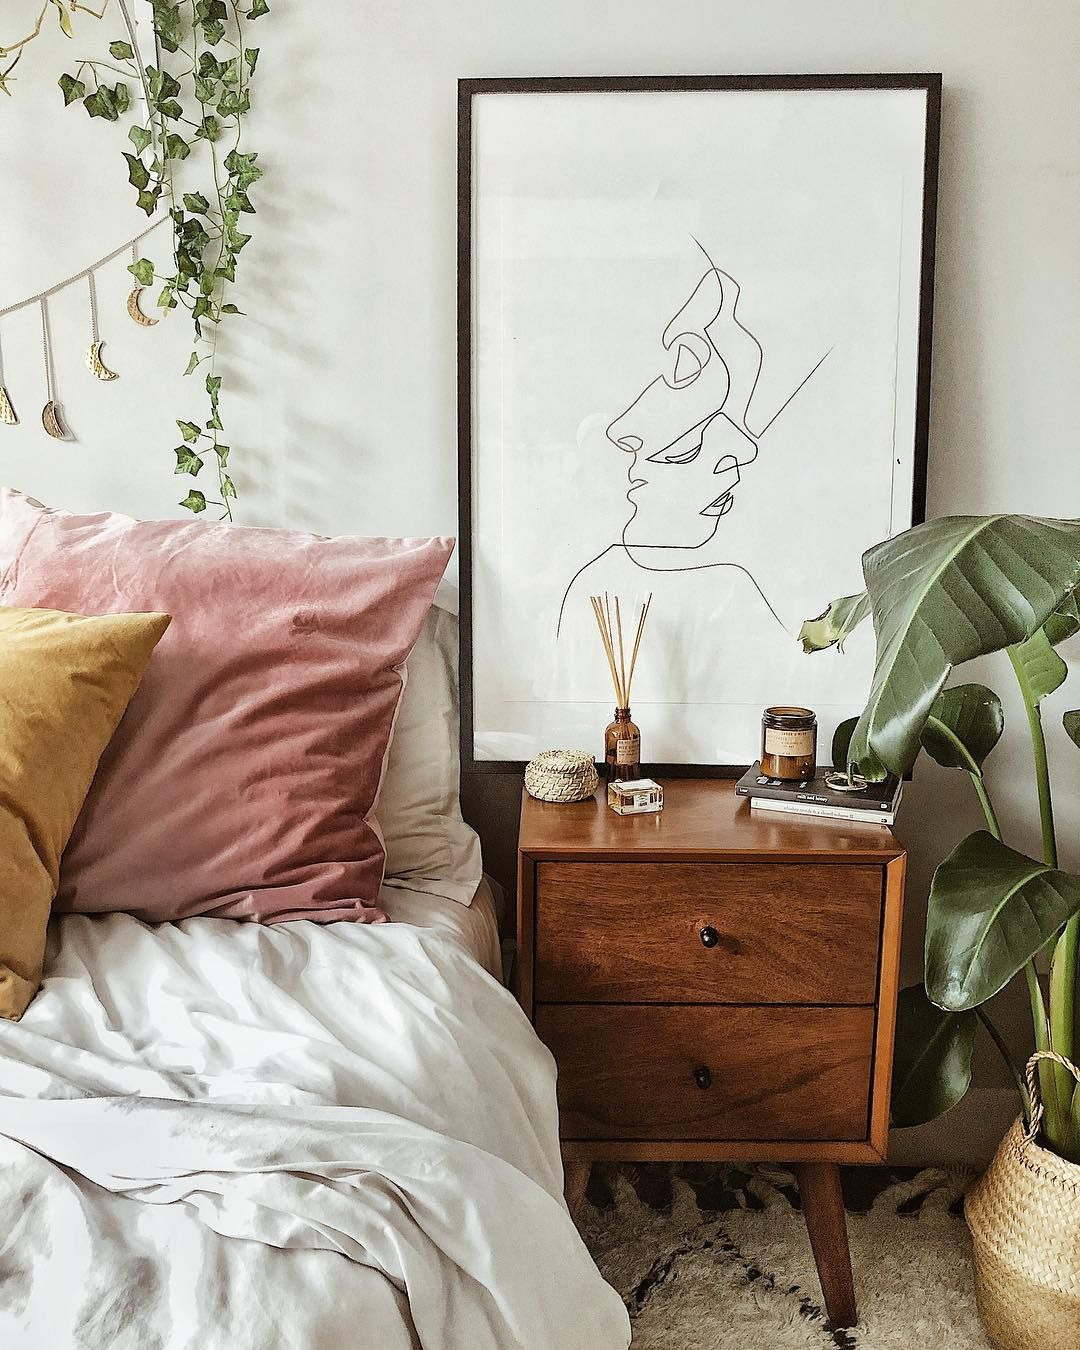 Riityeyayeѕt Mma Kyeiziyeyeye Small Bedroom Decor Cozy Small Bedrooms Home Decor